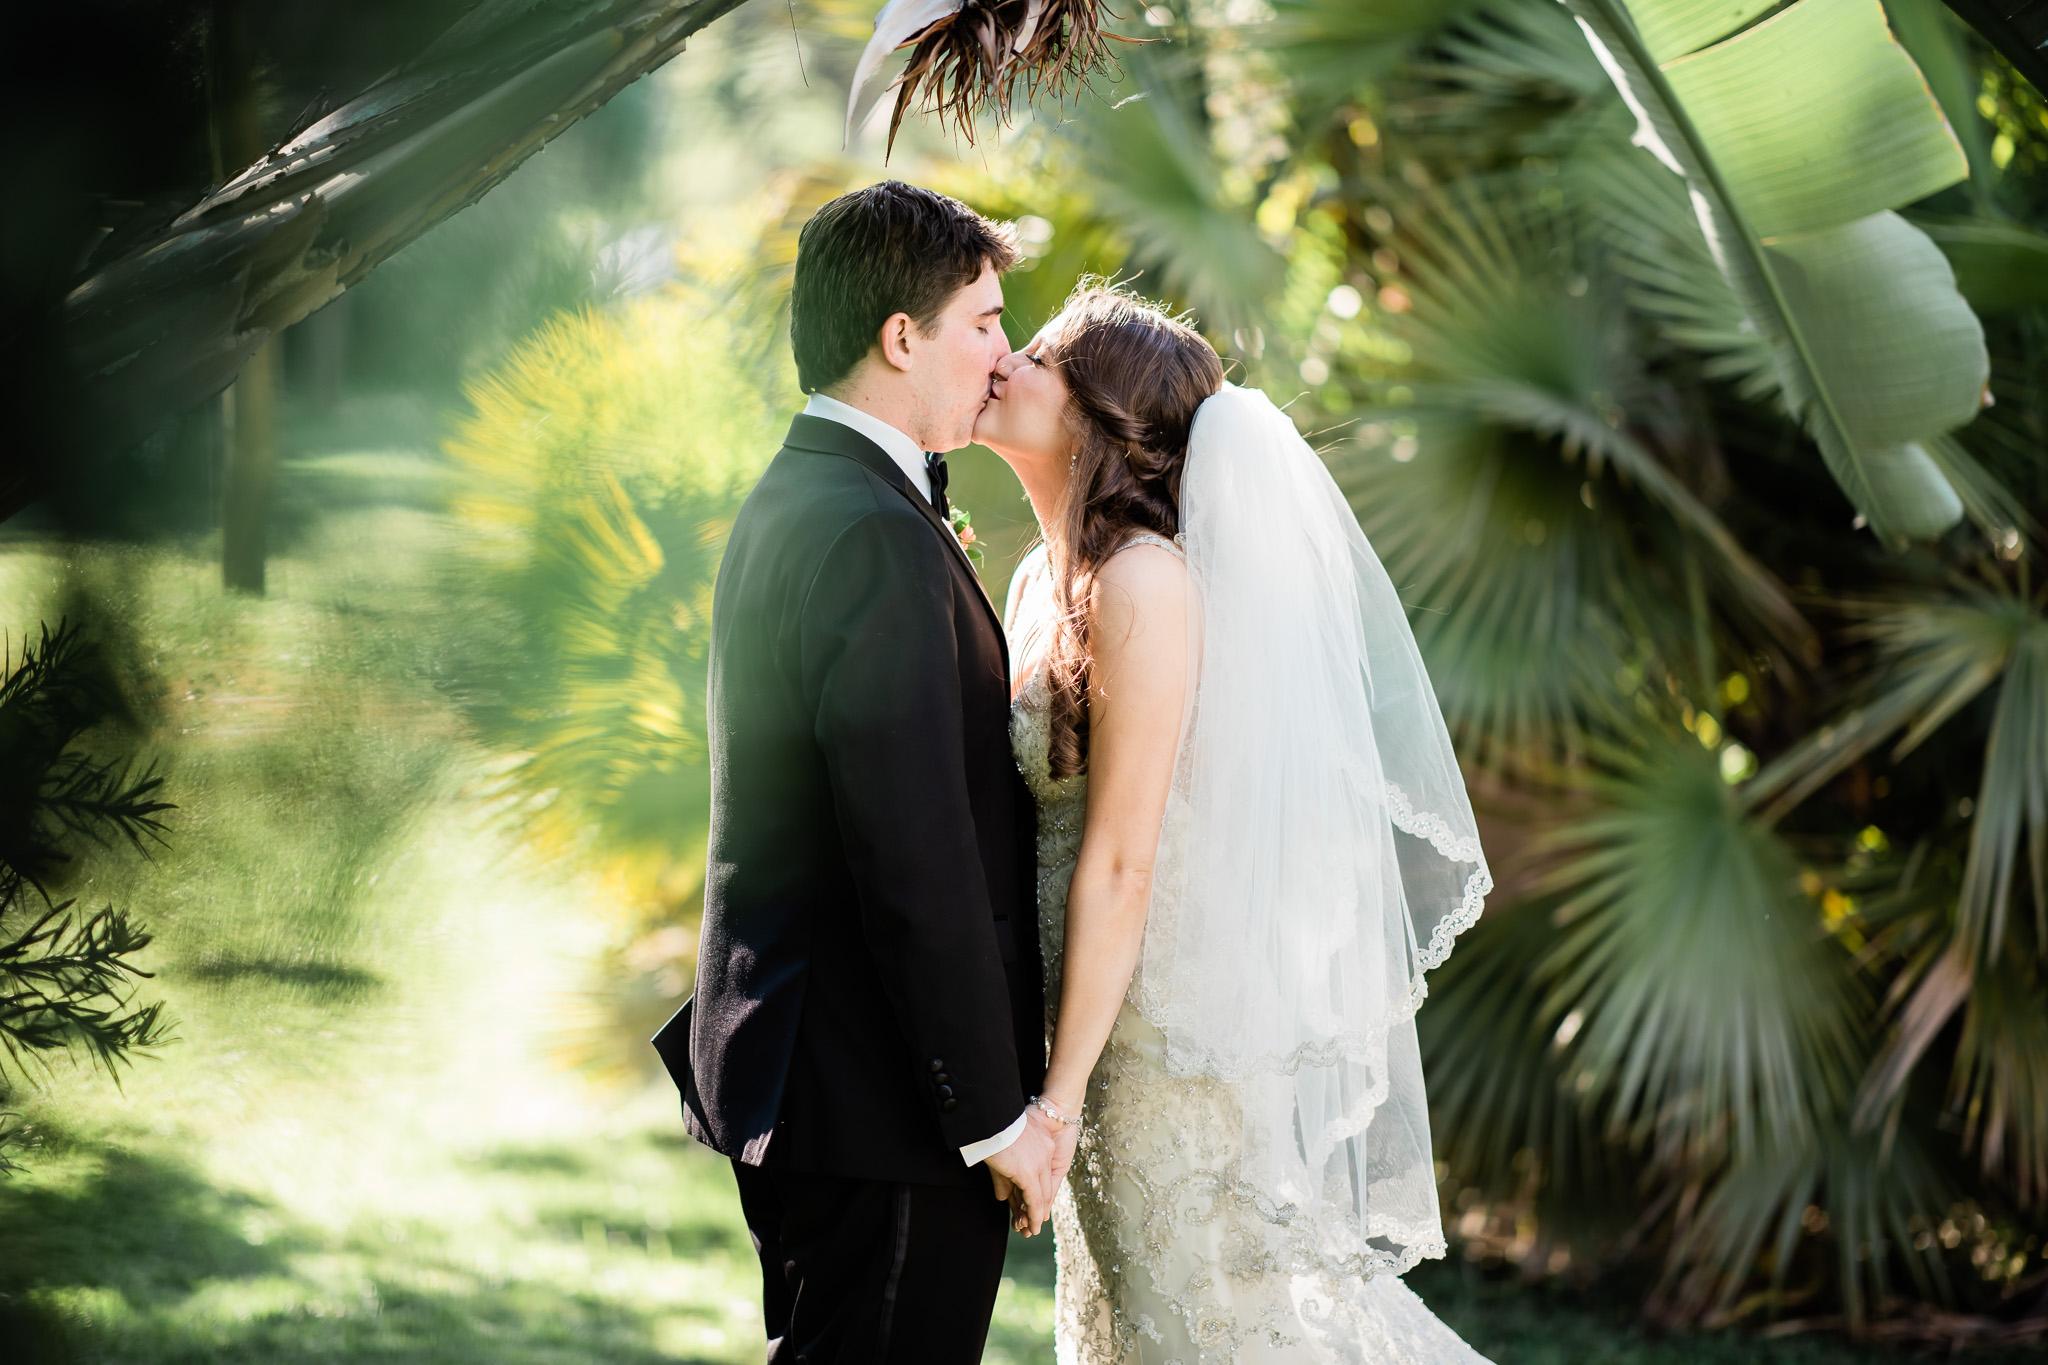 TAMPA_WEDDING_PHOTOGRAPHER_MPMZ_D82_2332_0050.jpg